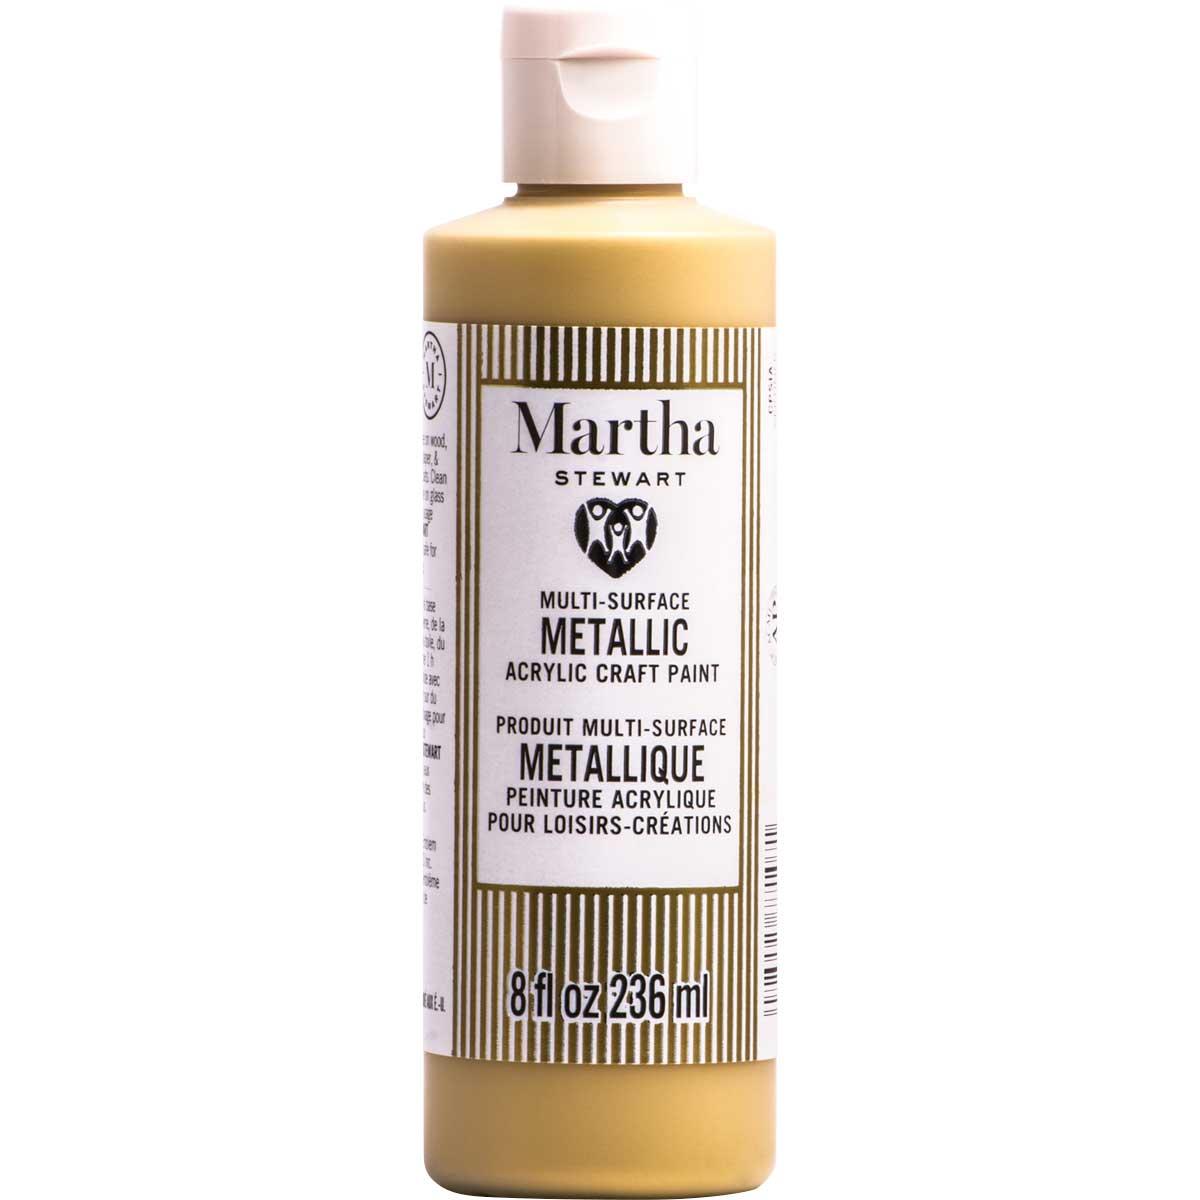 Martha Stewart® 8oz Multi-Surface Metallic Acrylic Craft Paint - Royal Gold